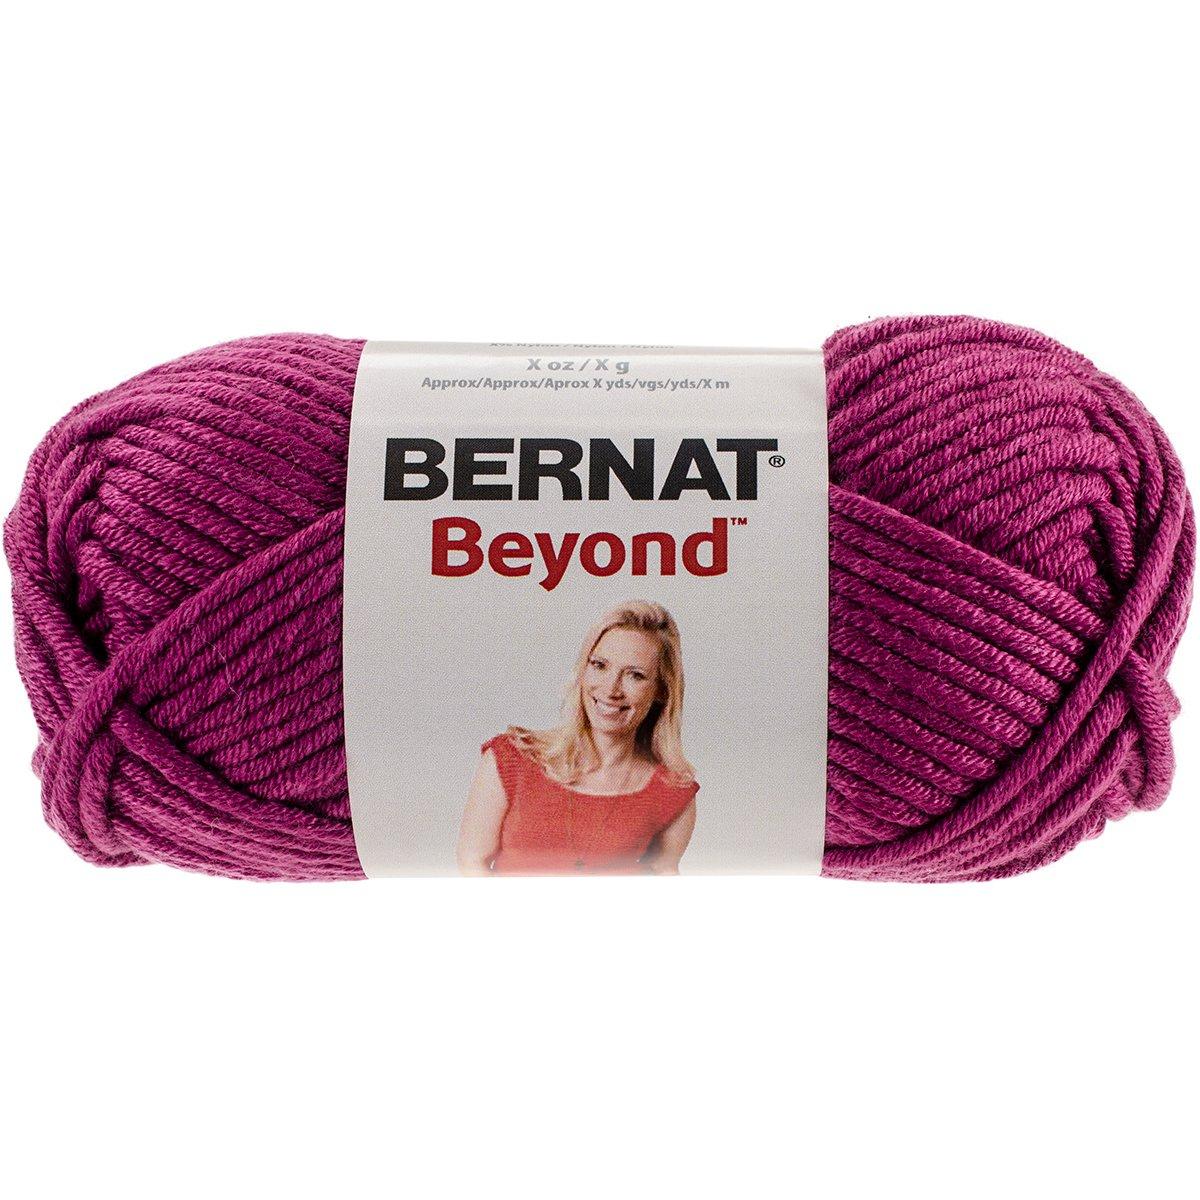 Quartz Pink Bernat Beyond